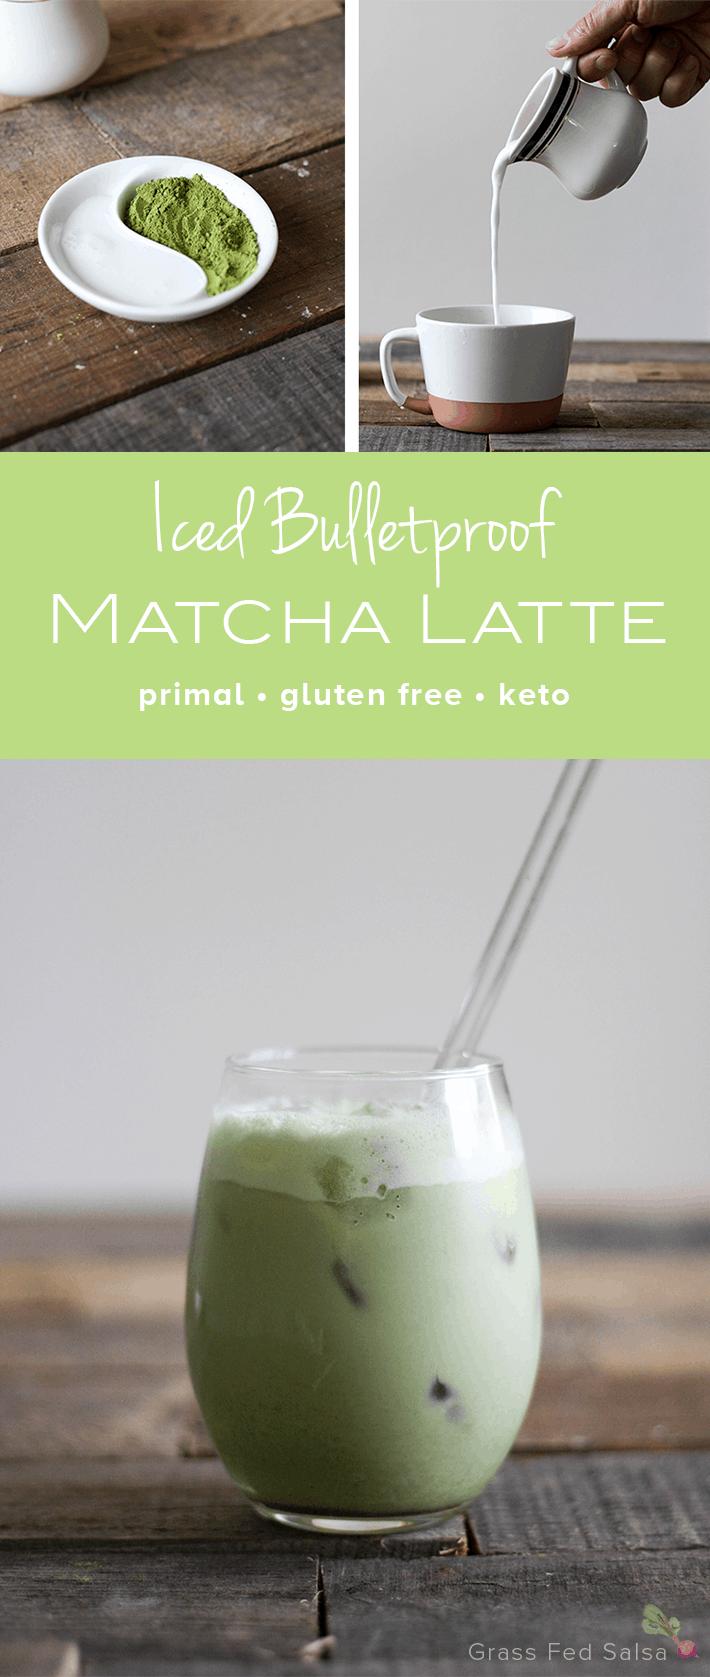 Iced Bulletproof Matcha Latte - dairy free